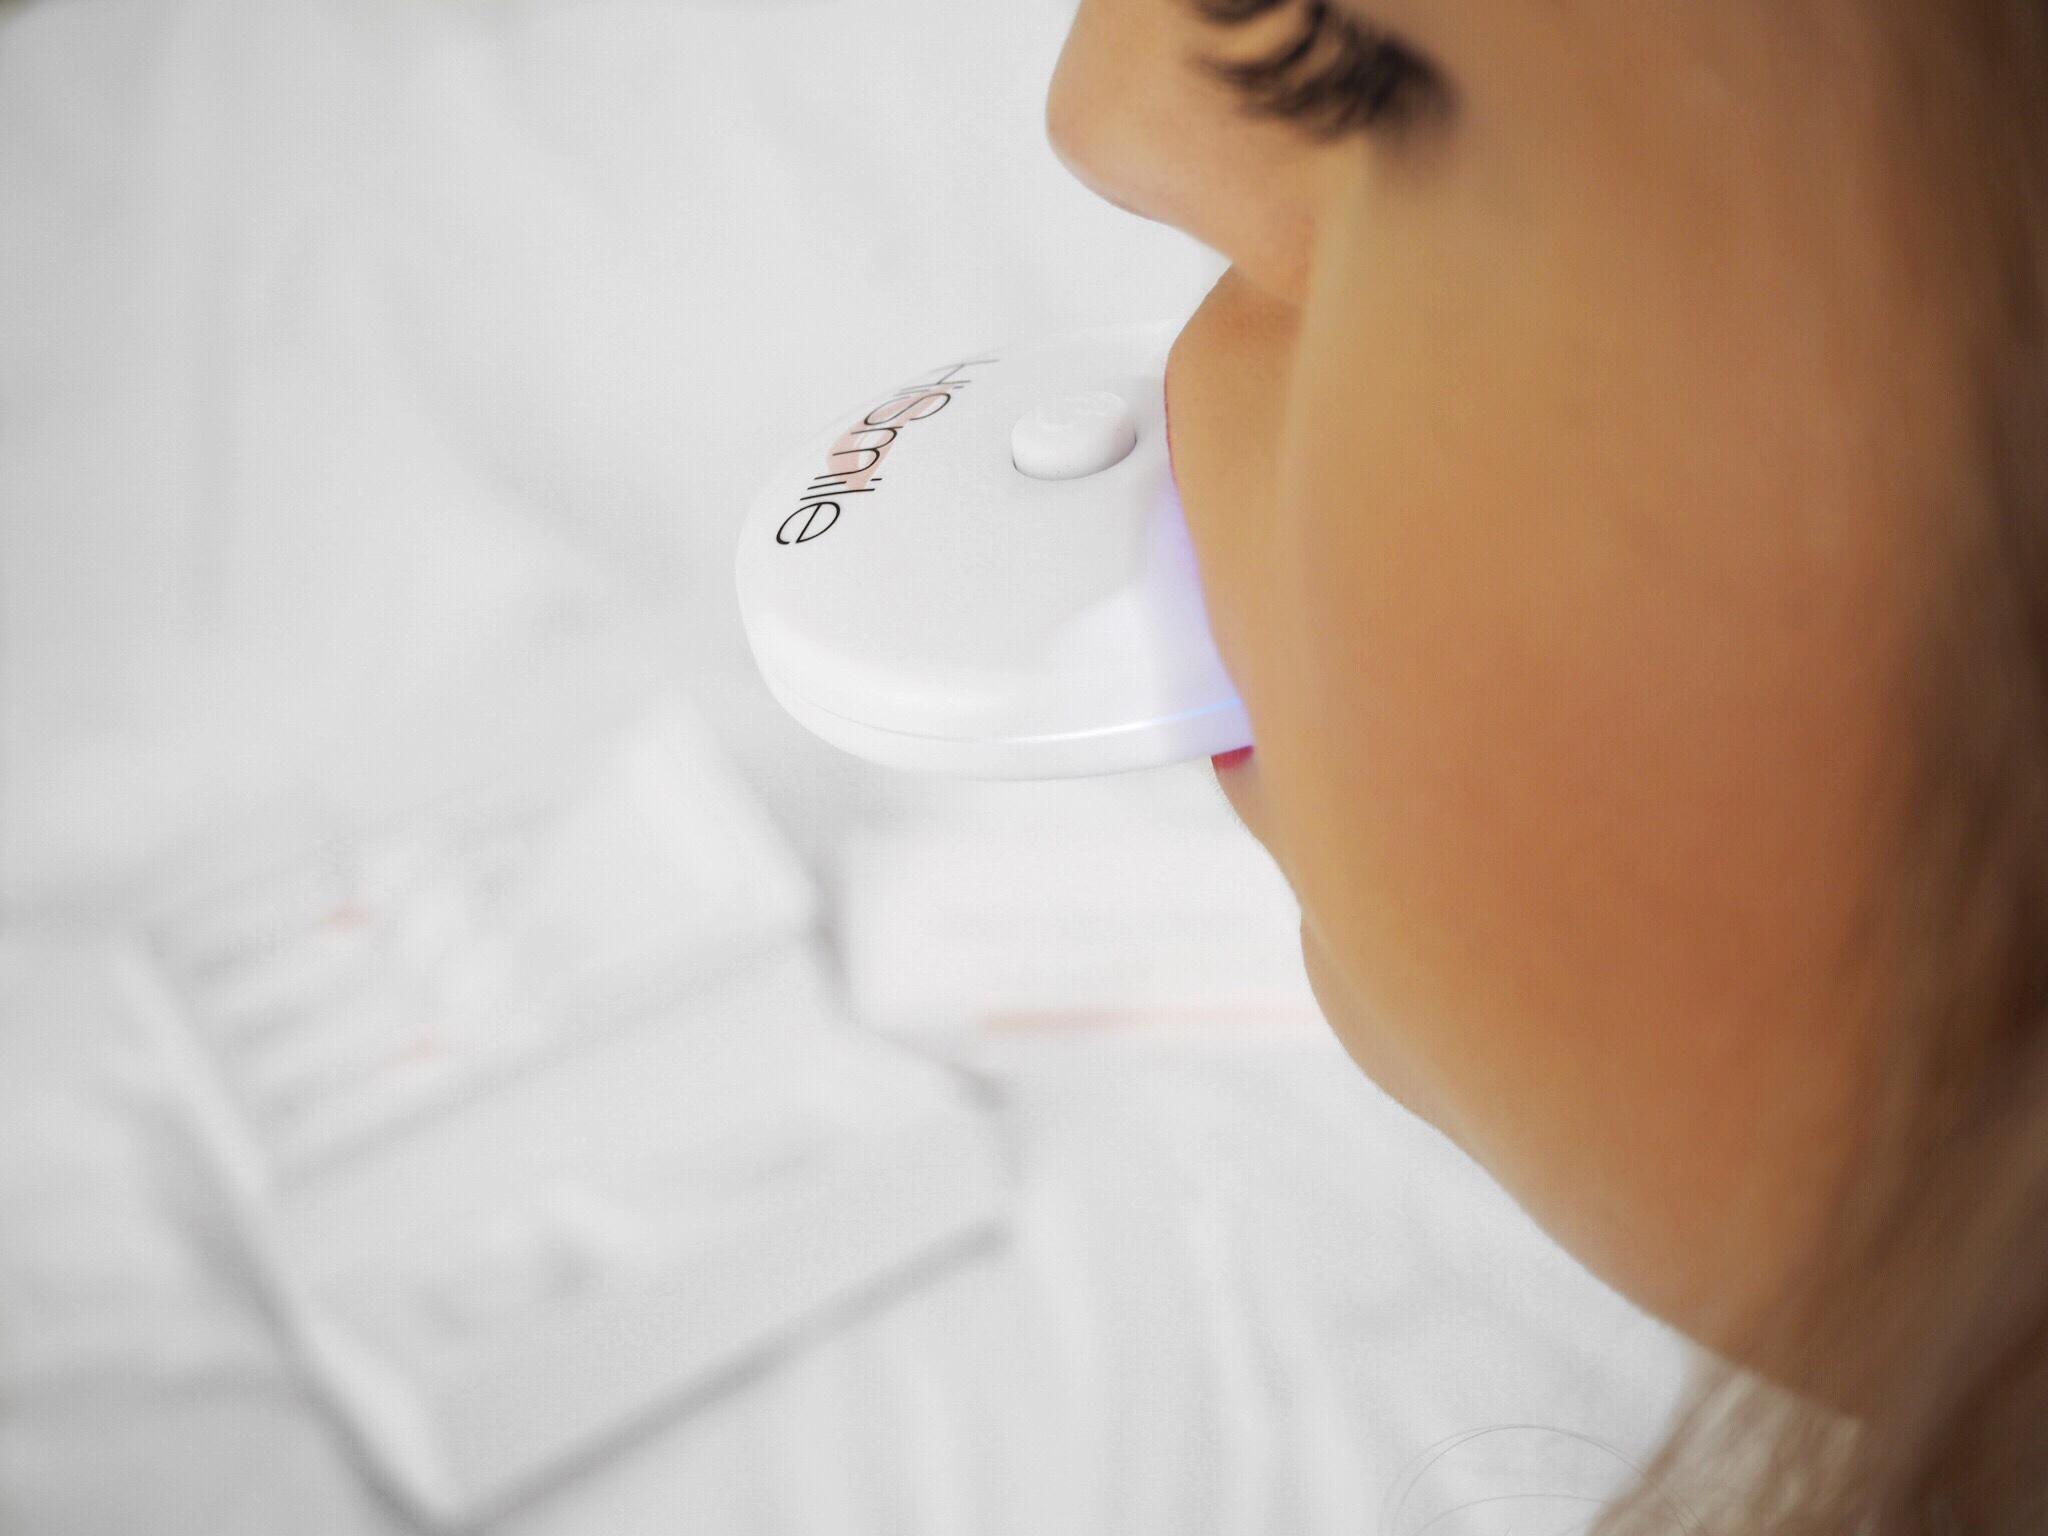 hismile teeth whitening instructions